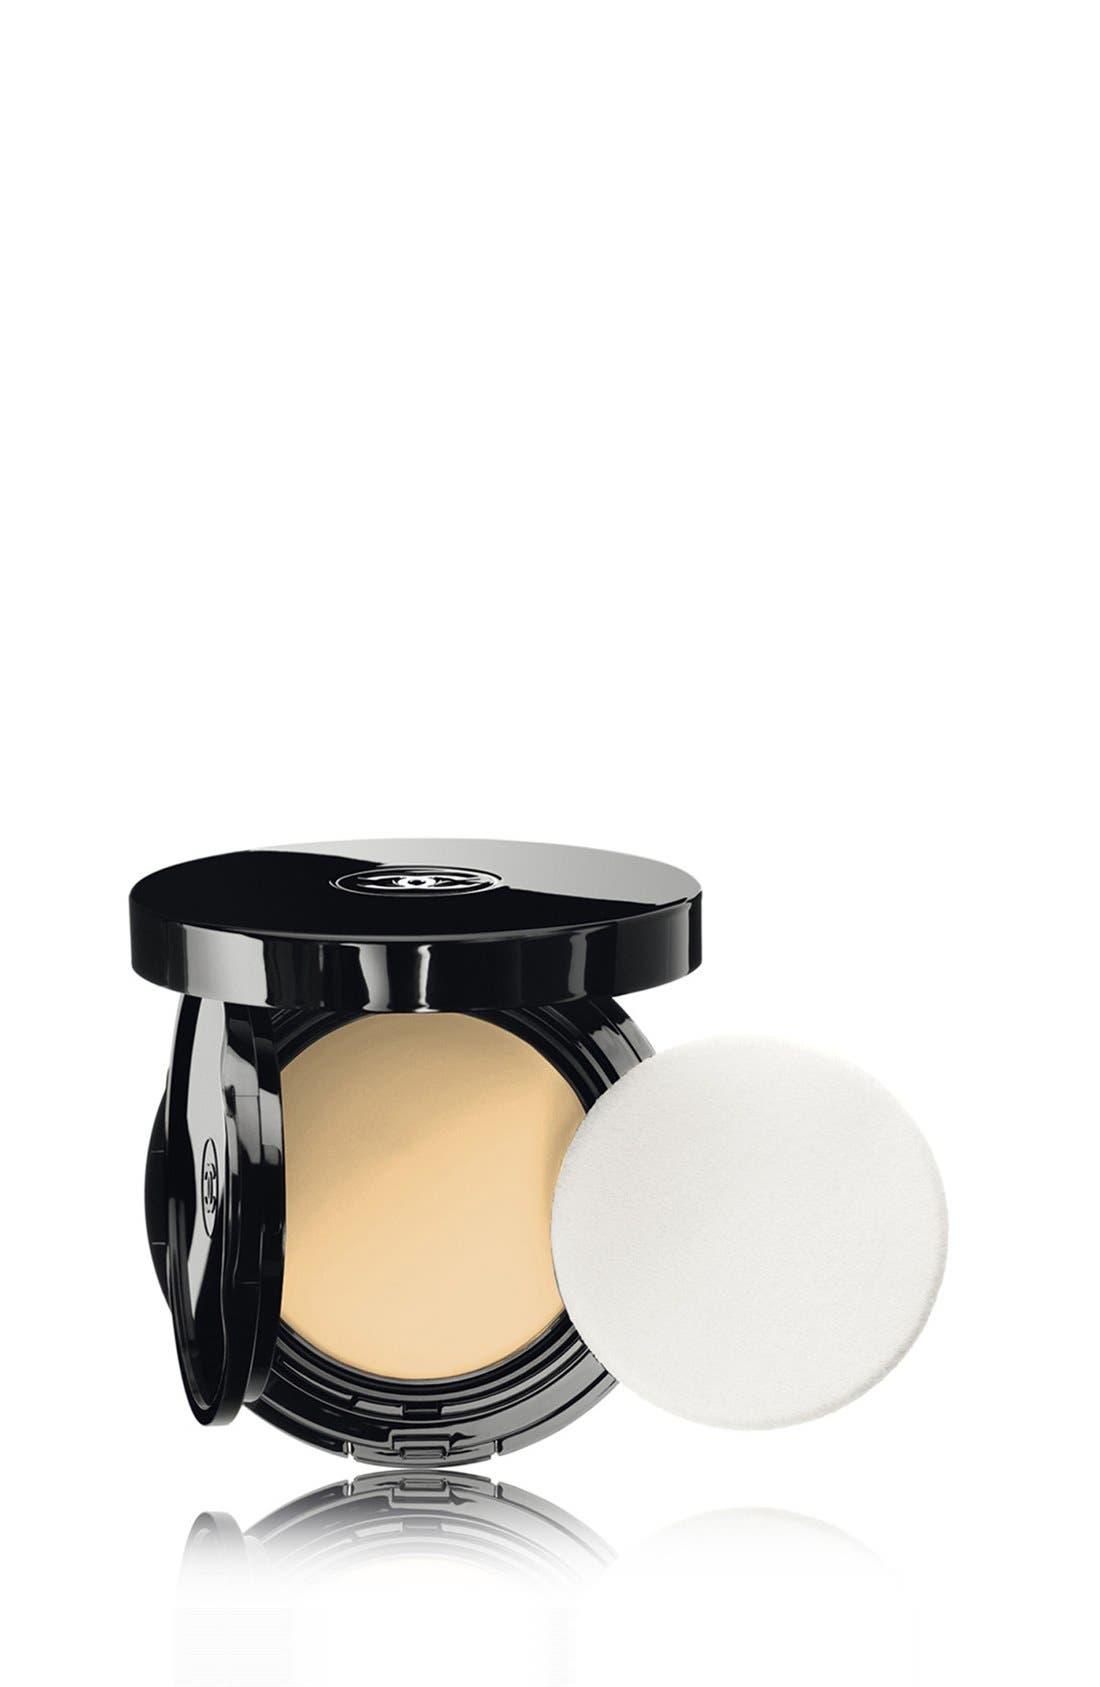 VITALUMIÈRE AQUA<br />Fresh and Hydrating Cream Compact Sunscreen Makeup Broad Spectrum SPF 15,                             Main thumbnail 1, color,                             030